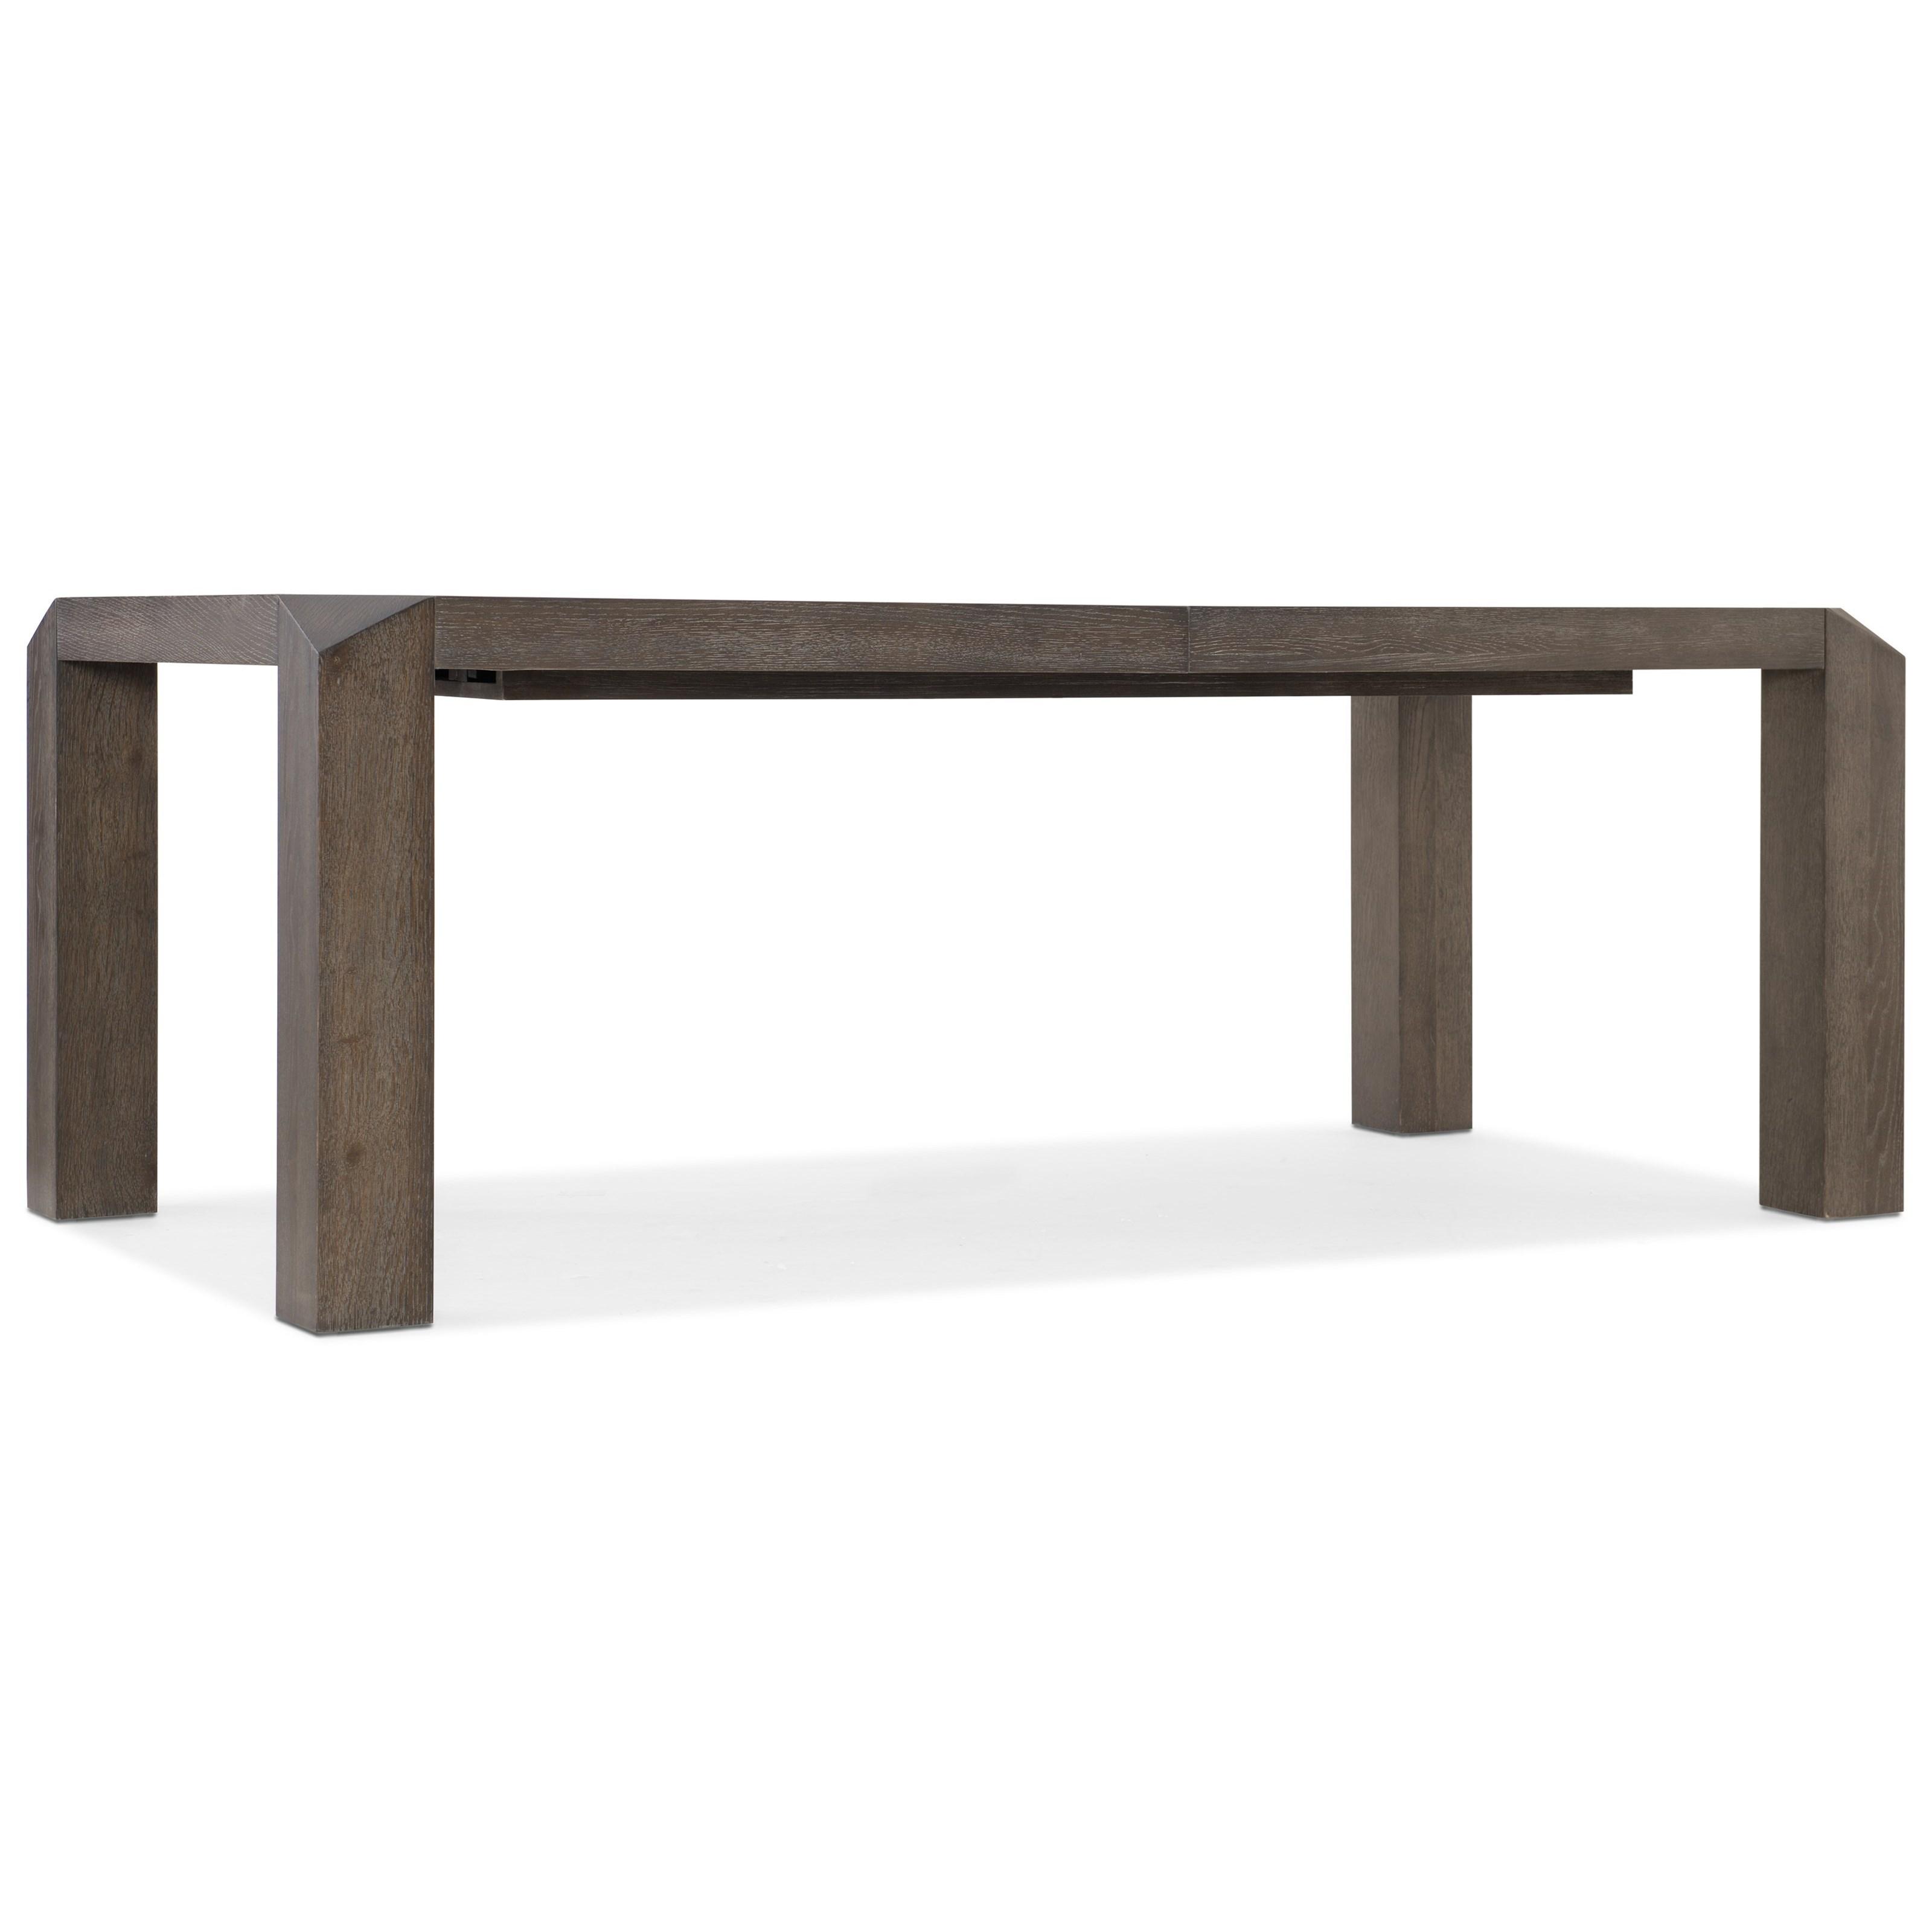 Miramar Aventura Vermeer 82in Leg Dining Table by Hooker Furniture at Stoney Creek Furniture